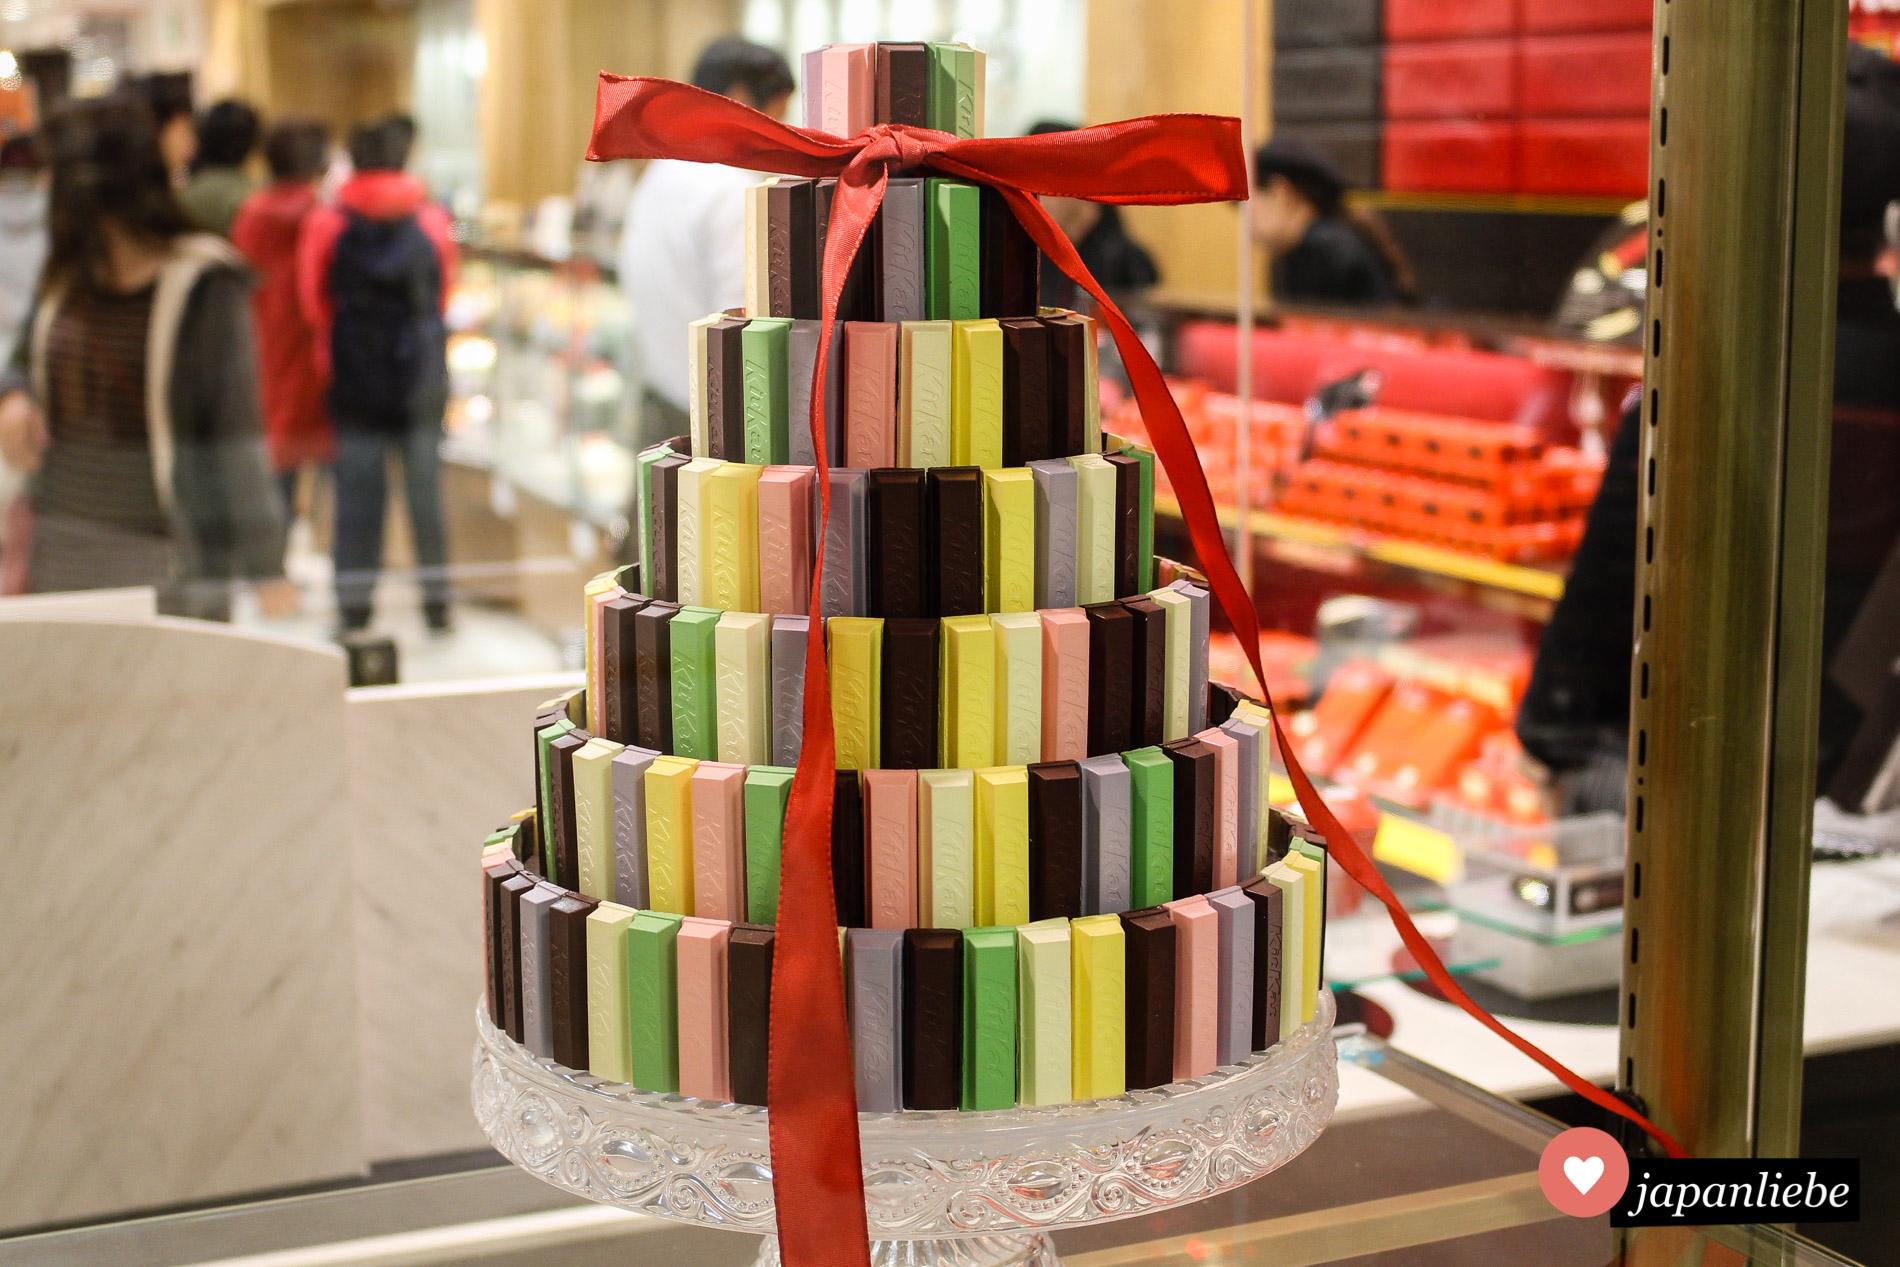 Erinnert an Ladurée: eine KitKat-Pyramide.